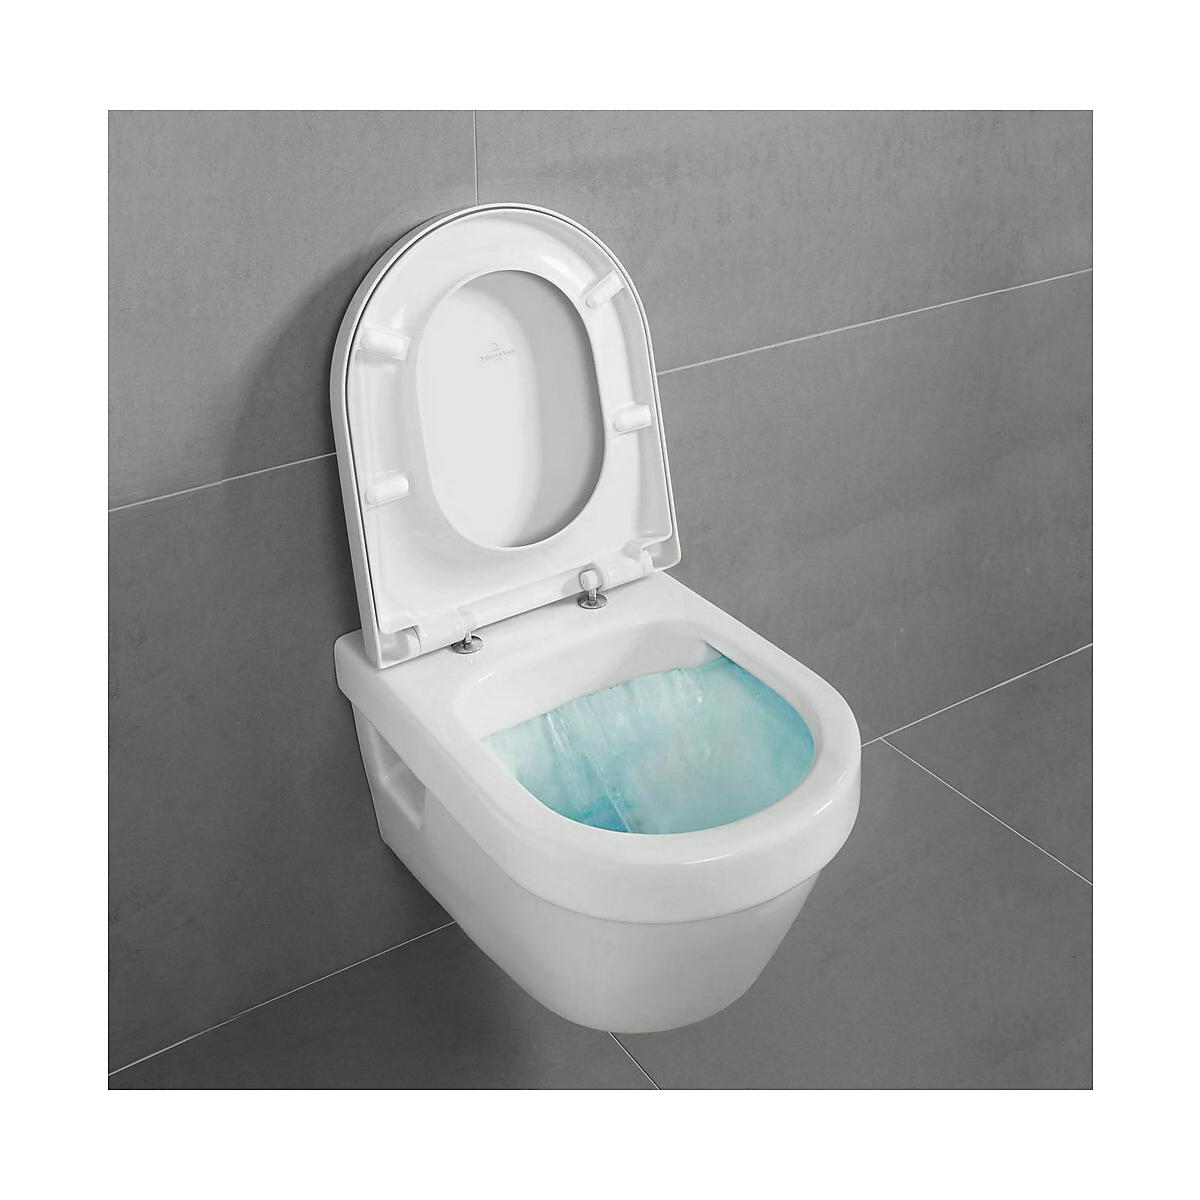 v b architectura vegghengt toalett 370x530 mm med directflush. Black Bedroom Furniture Sets. Home Design Ideas